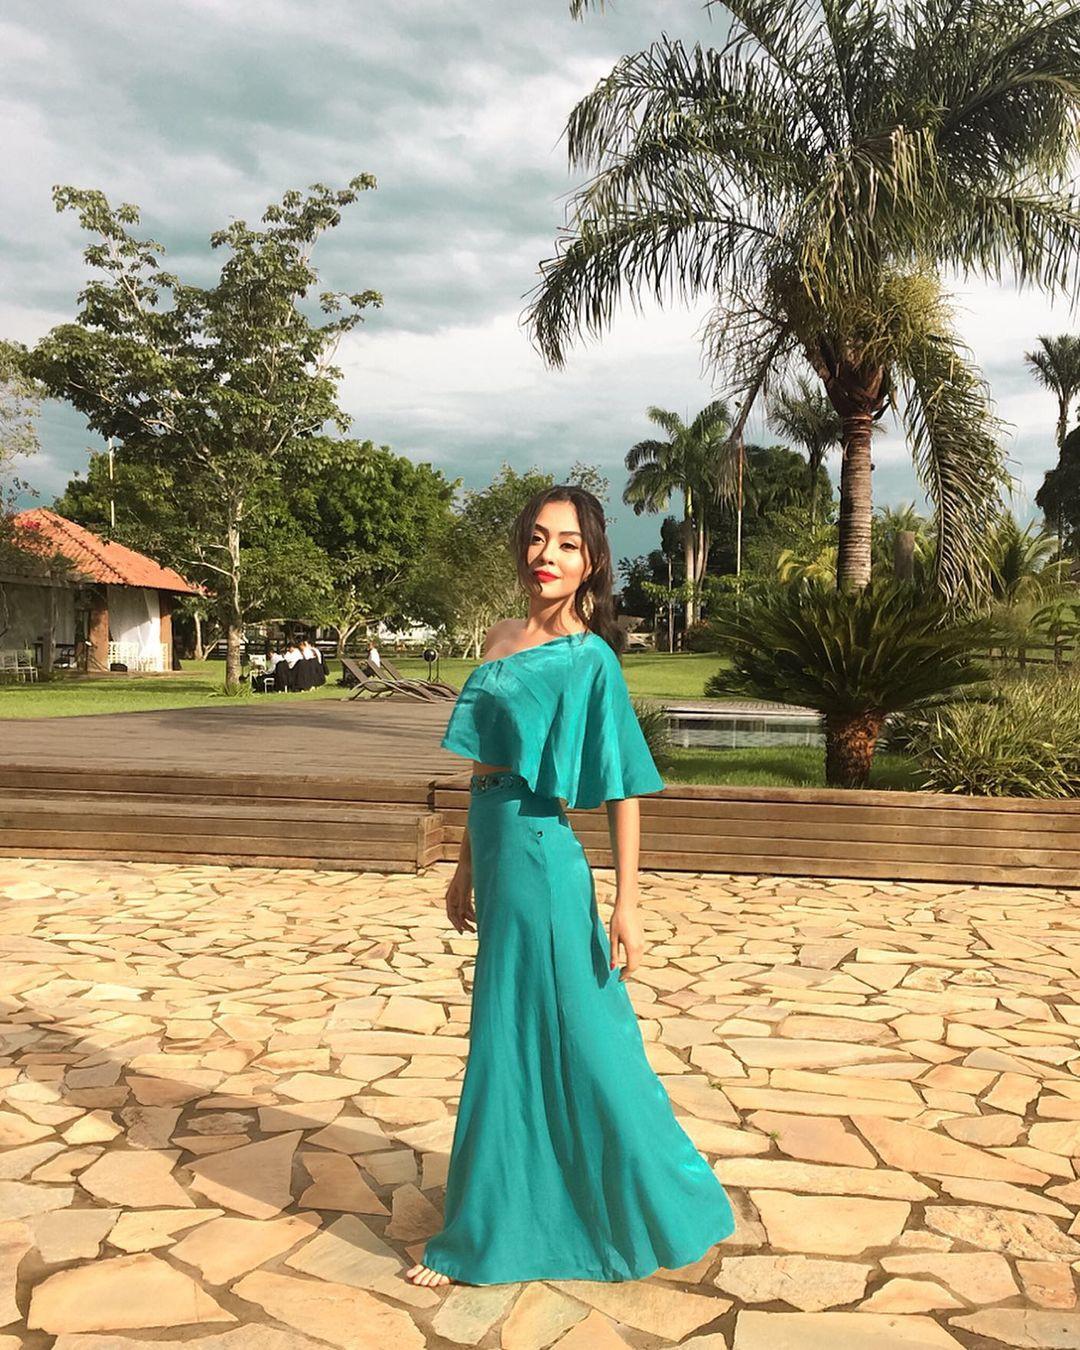 thaisi dias, miss madeira mamore mundo 2019. - Página 3 Qiygrv10